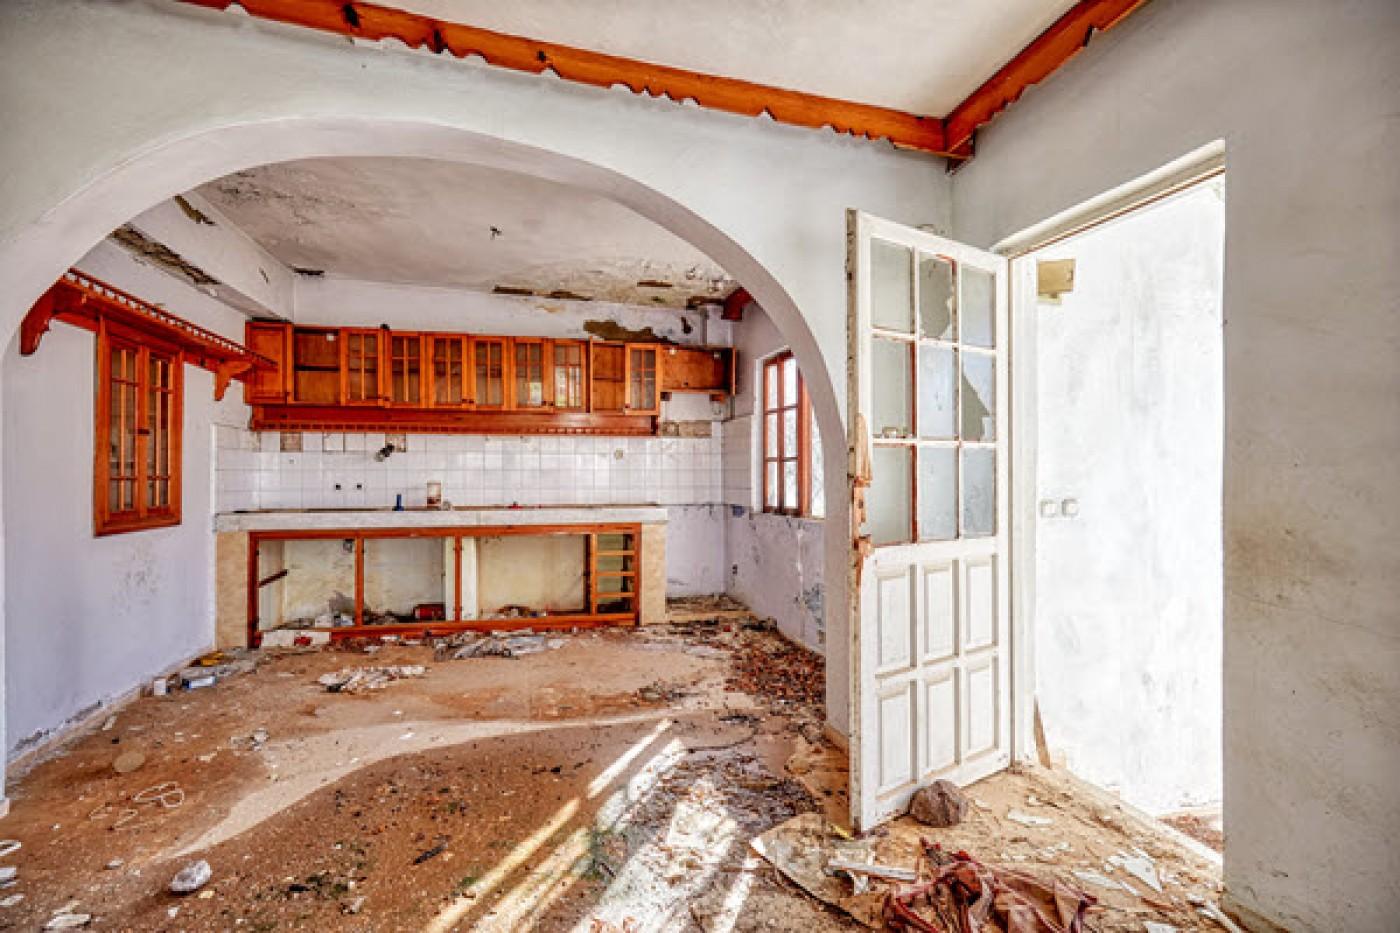 Vesta Vigilar squatter prevention for holiday homes along the Spanish Costas